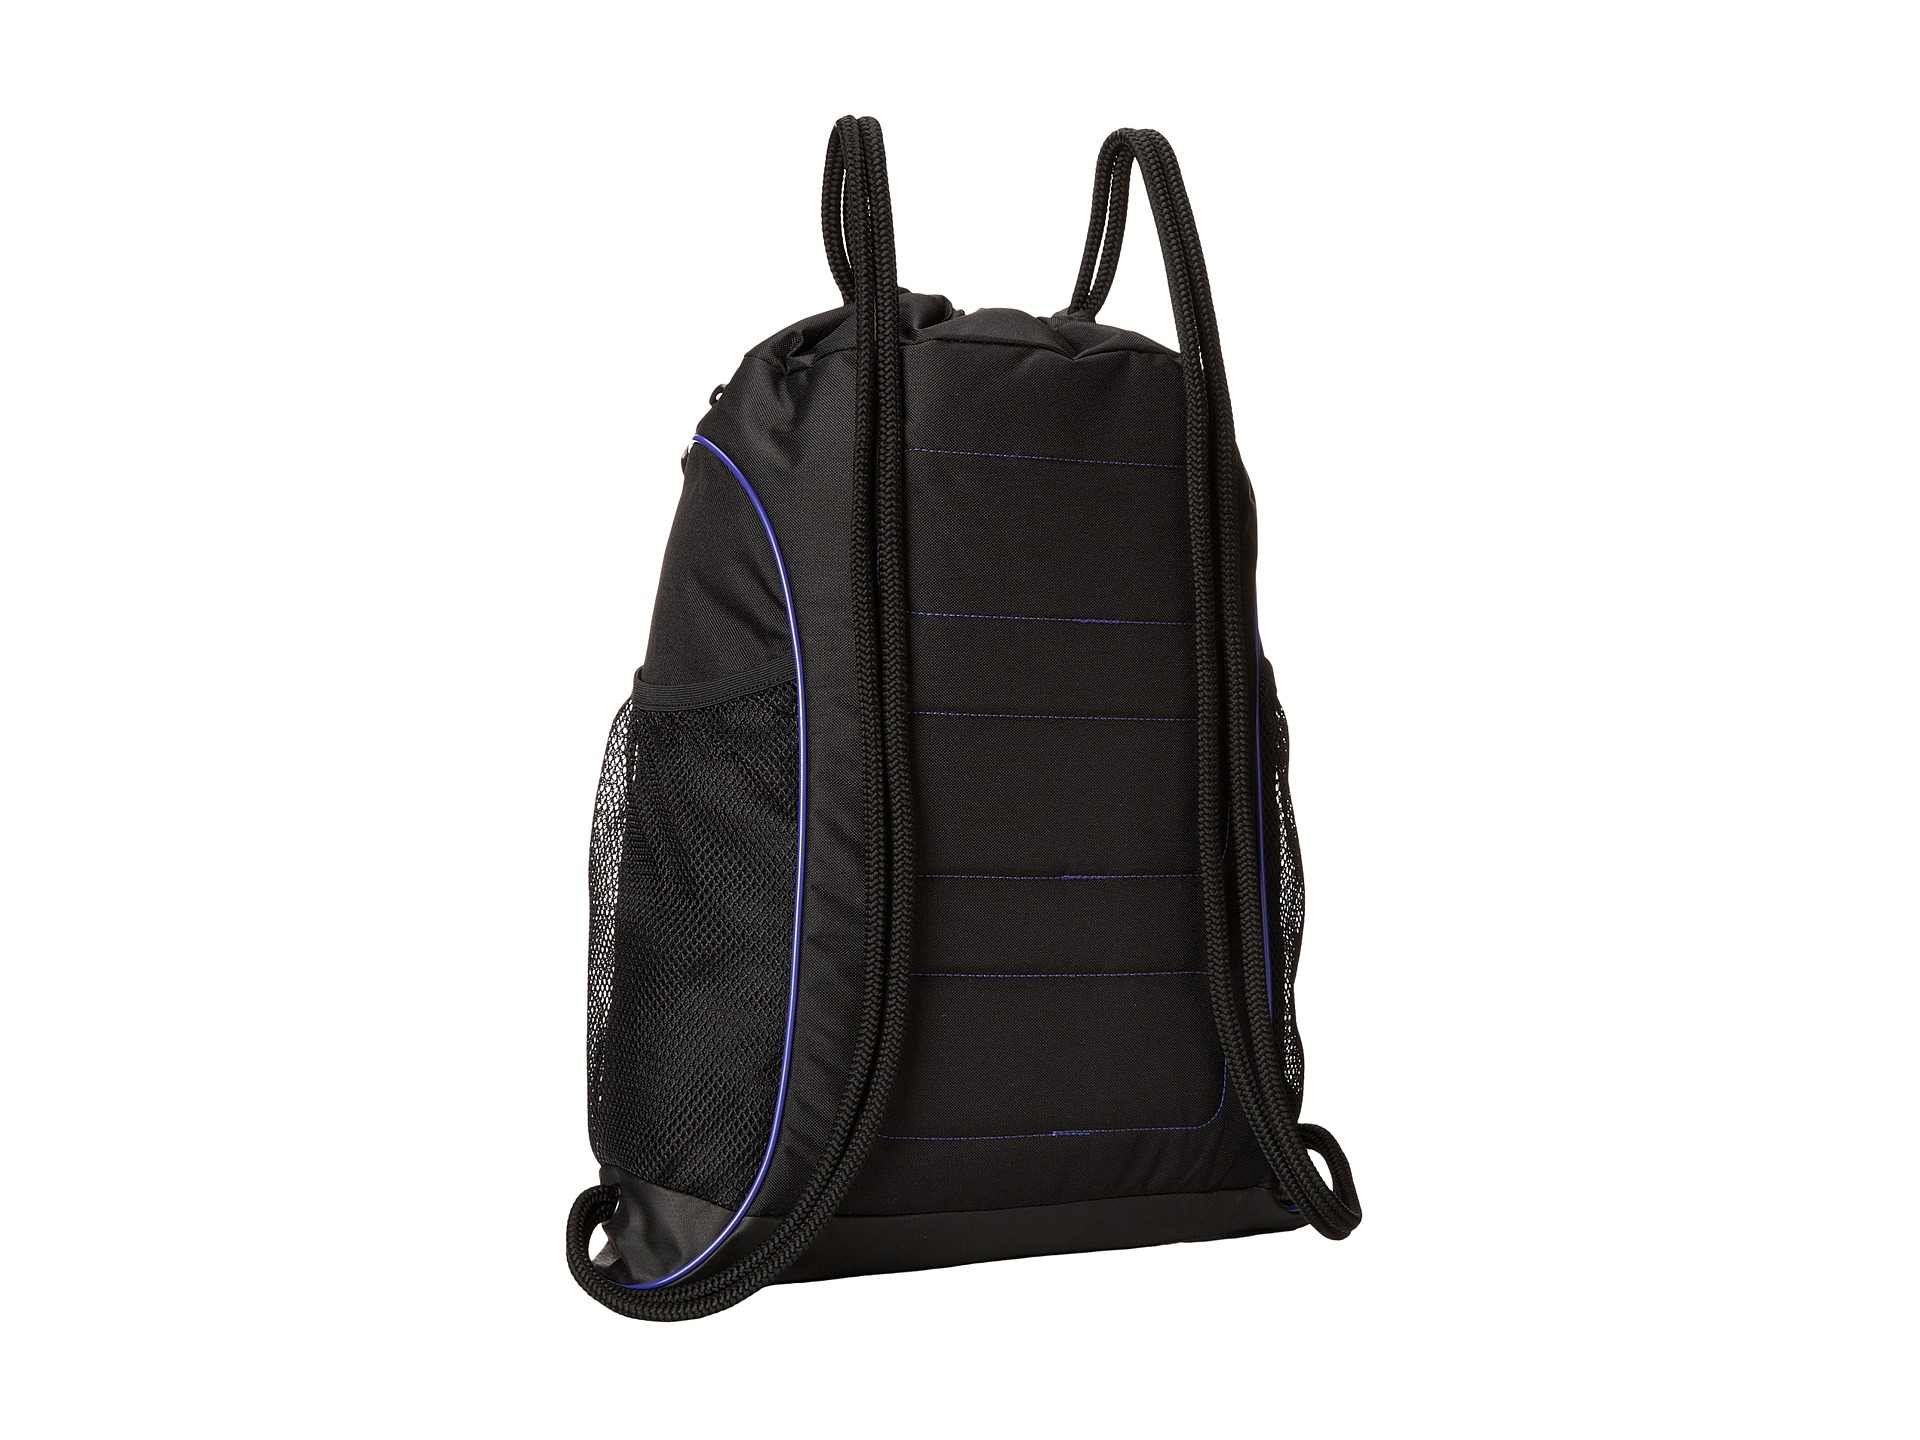 85c060f4155037 Lyst - adidas Strength Sackpack in Black